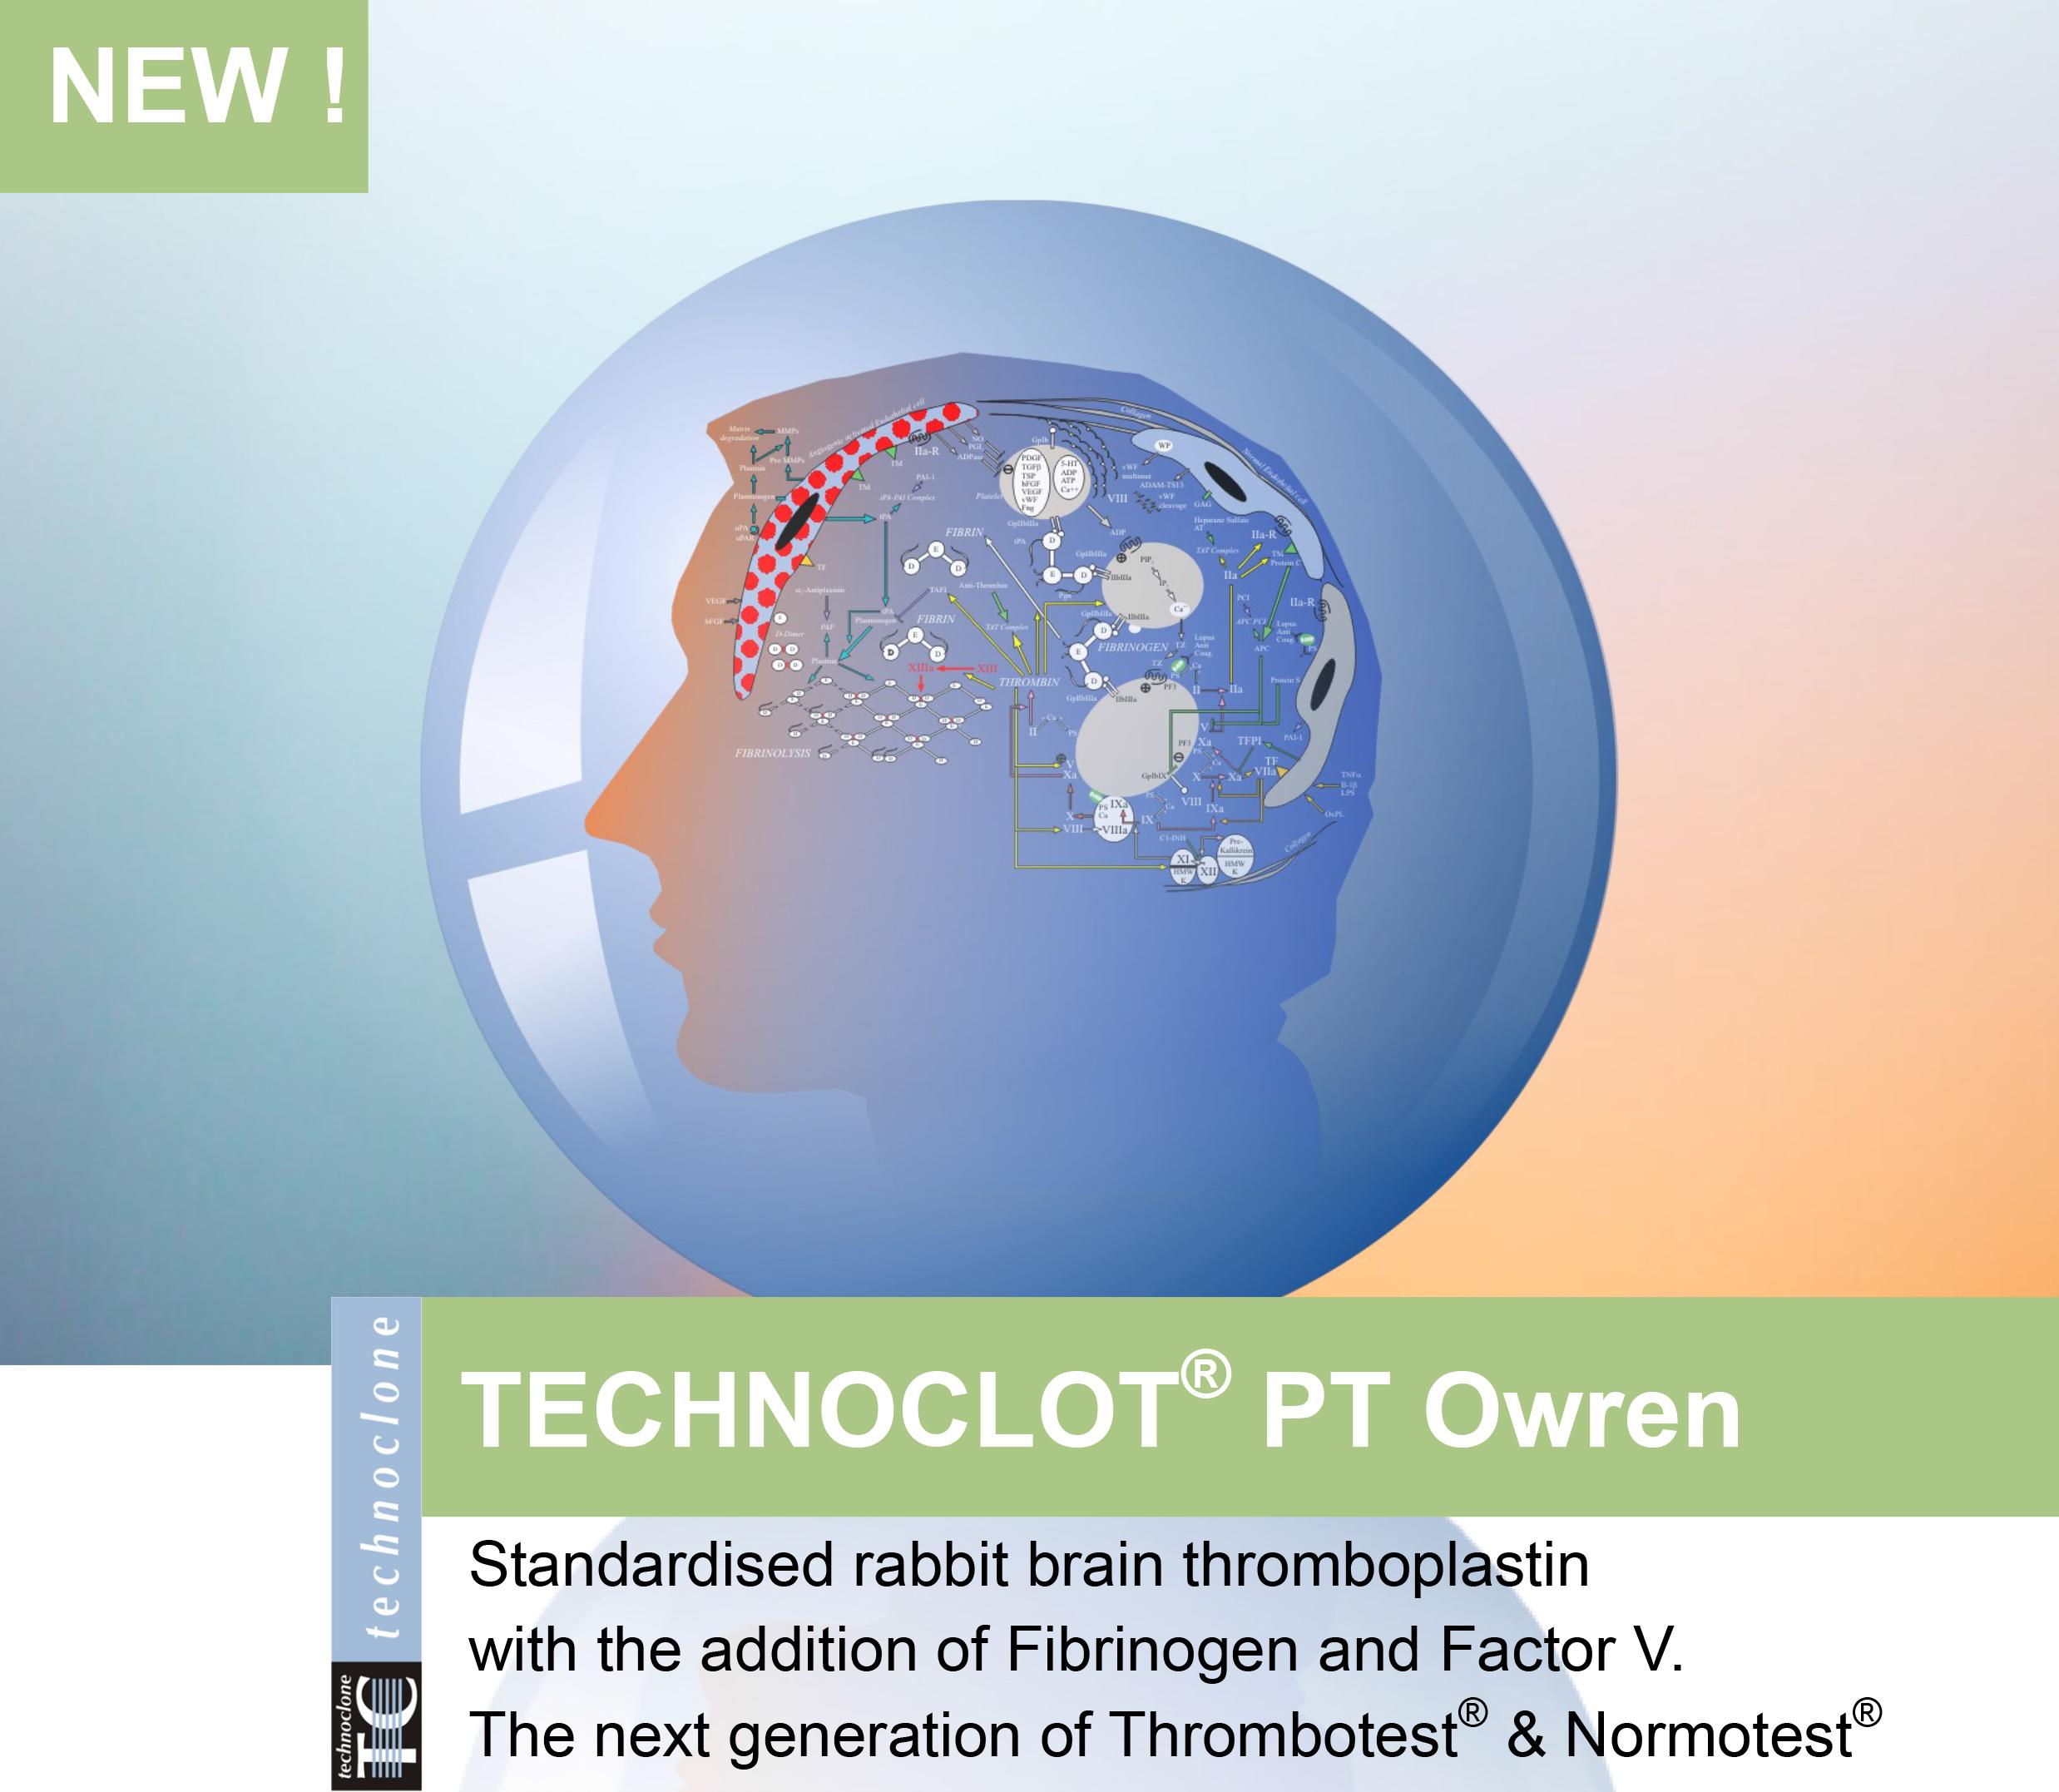 New PT Owren reagent